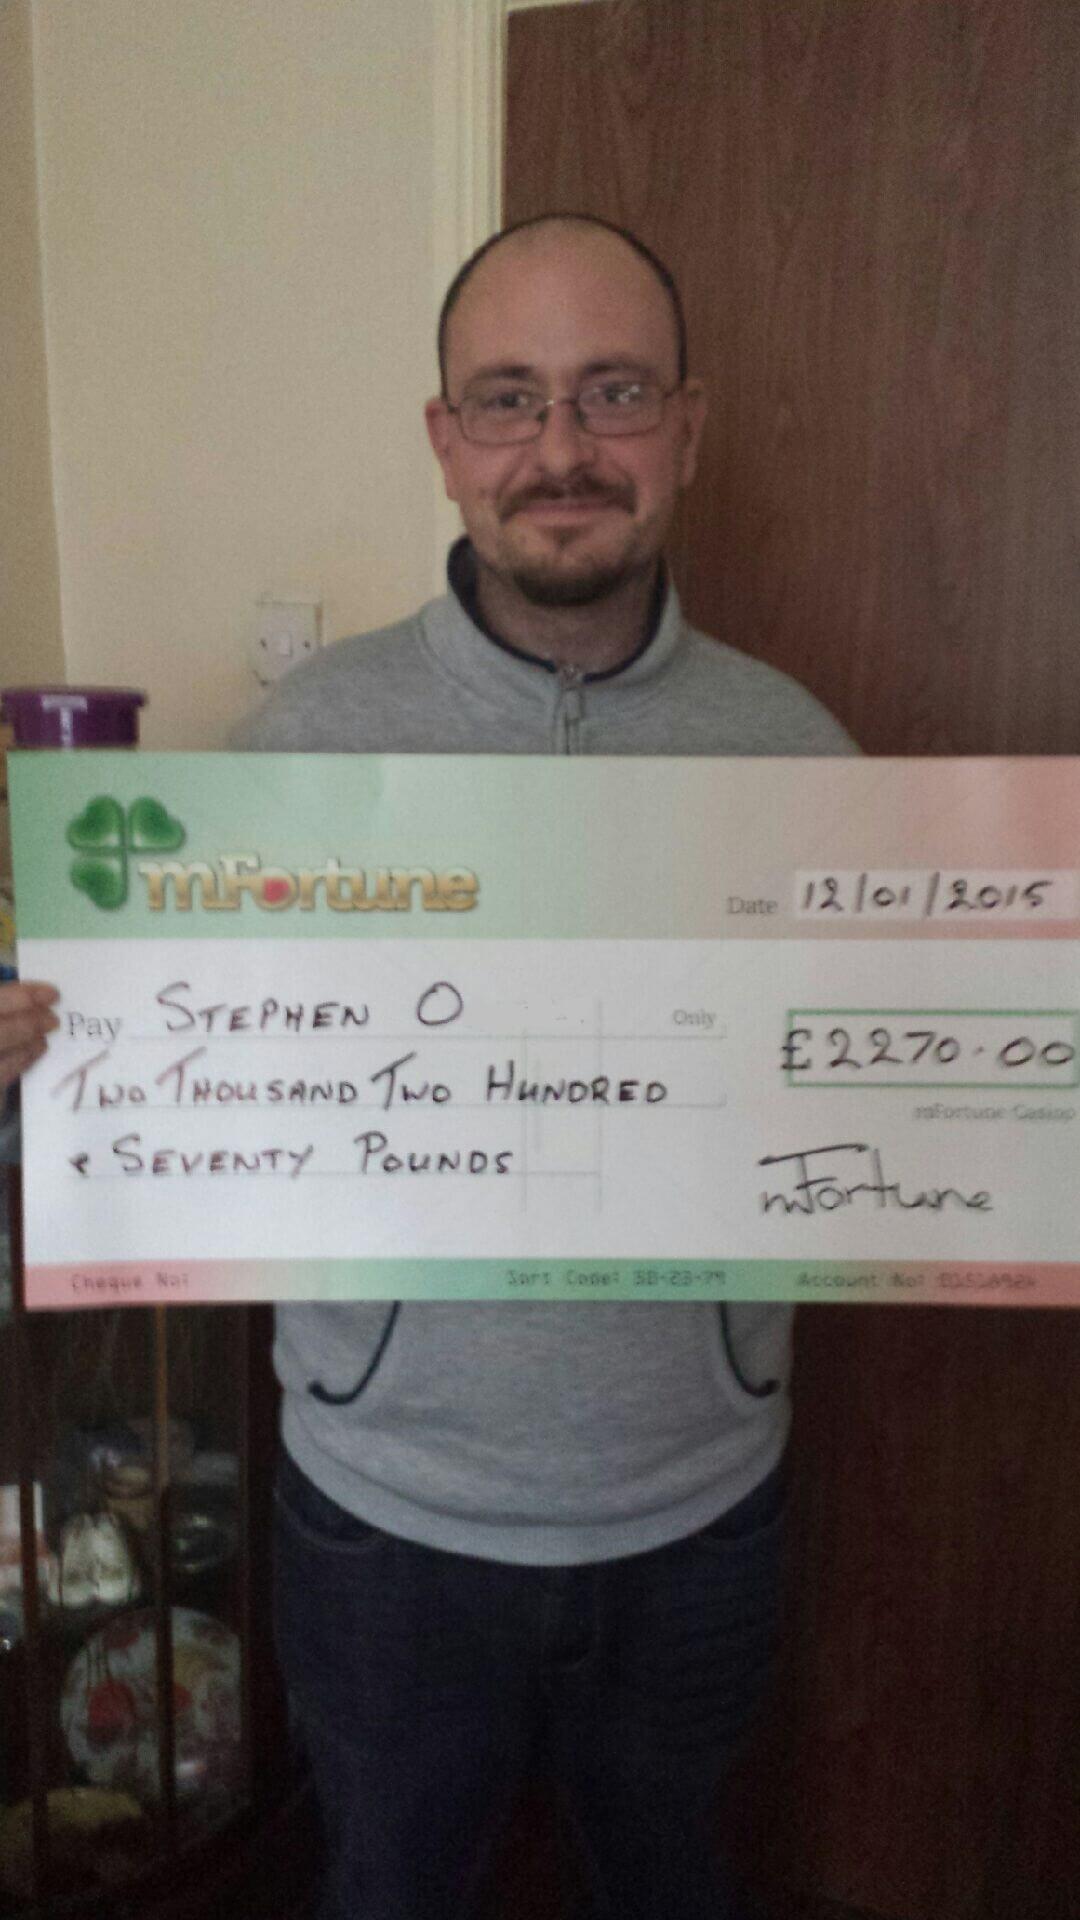 Stephen O won £ 2,270